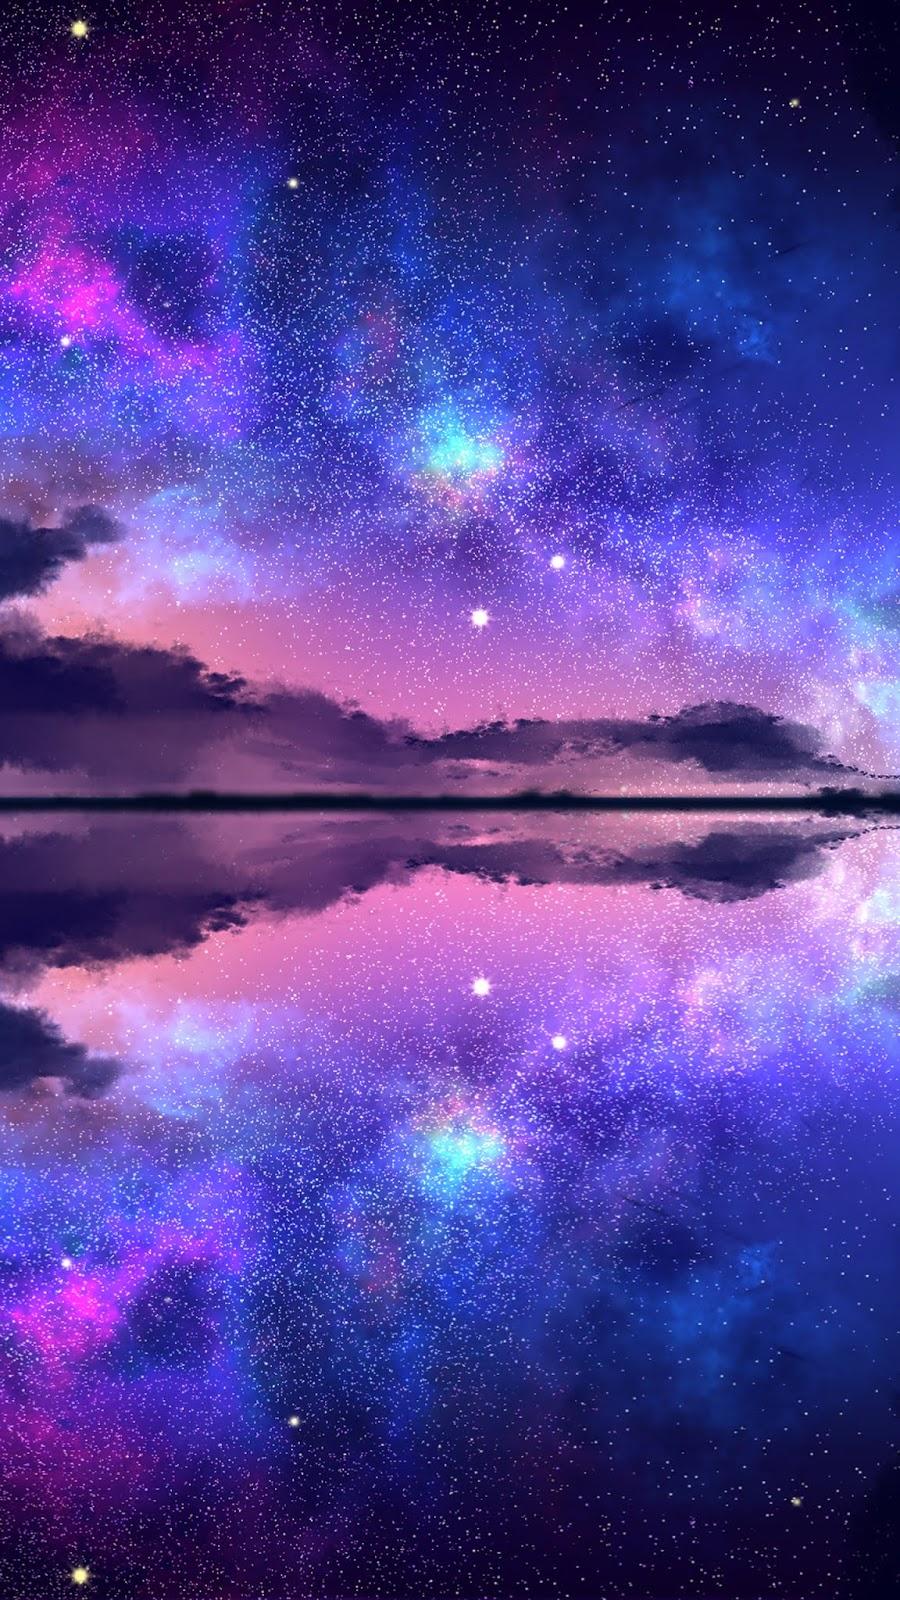 Night sky aesthetic